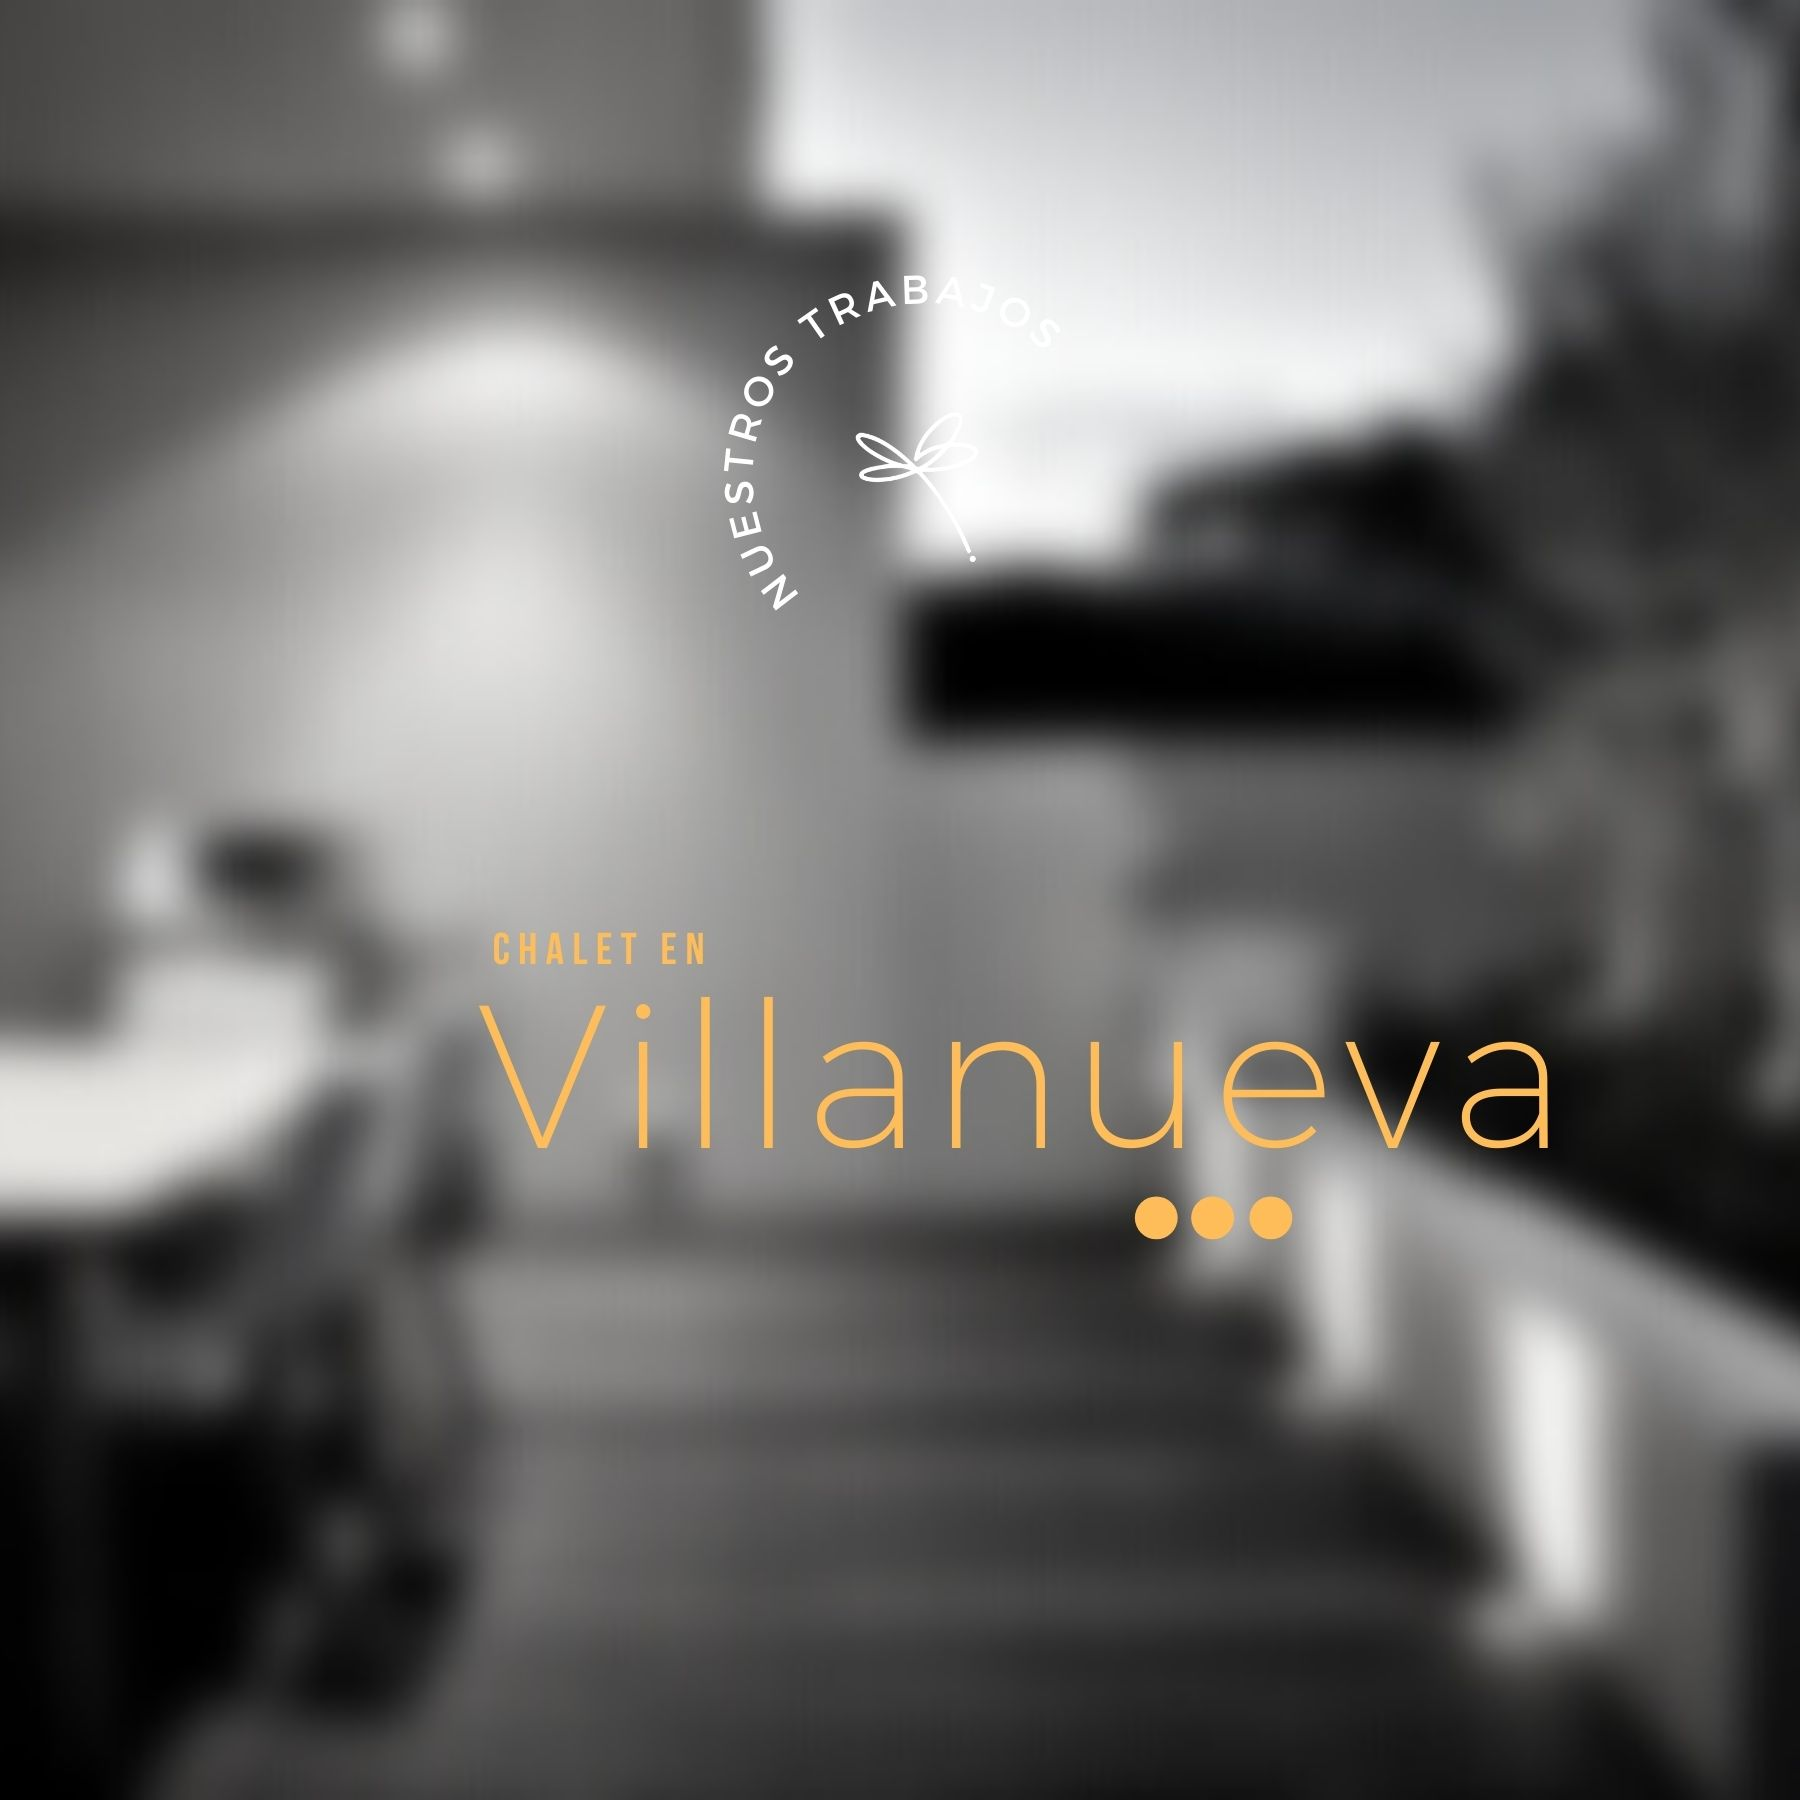 Chalet en Villanueva de la Cañada